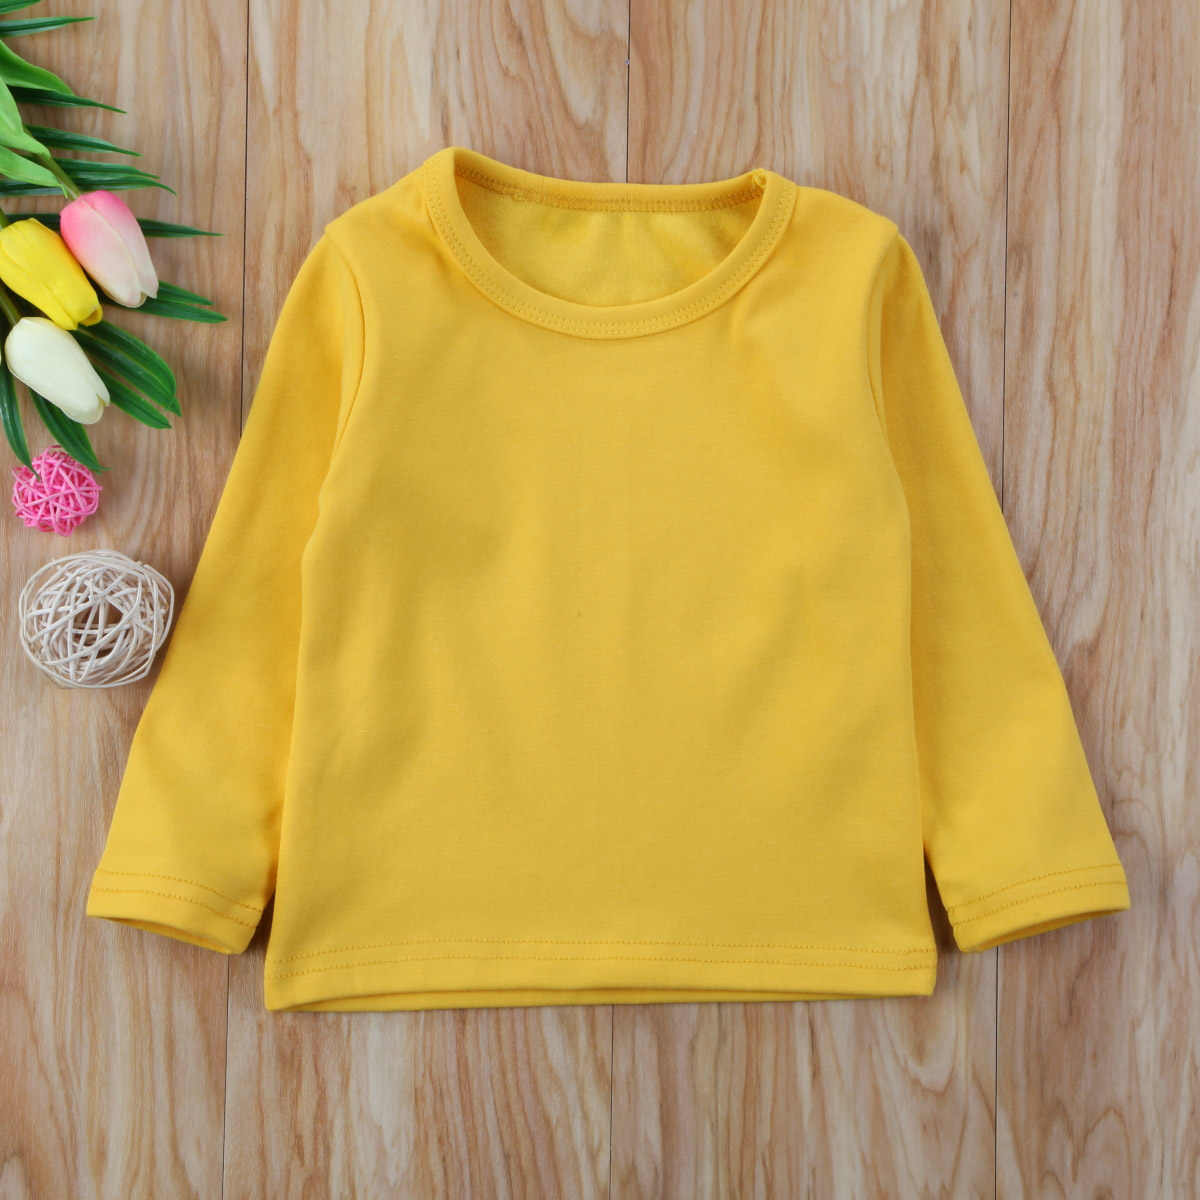 Peuter Kids Baby Meisje Katoen Candy Kleur Lange Mouwen t-shirt Tops Tee Shirt Kleding